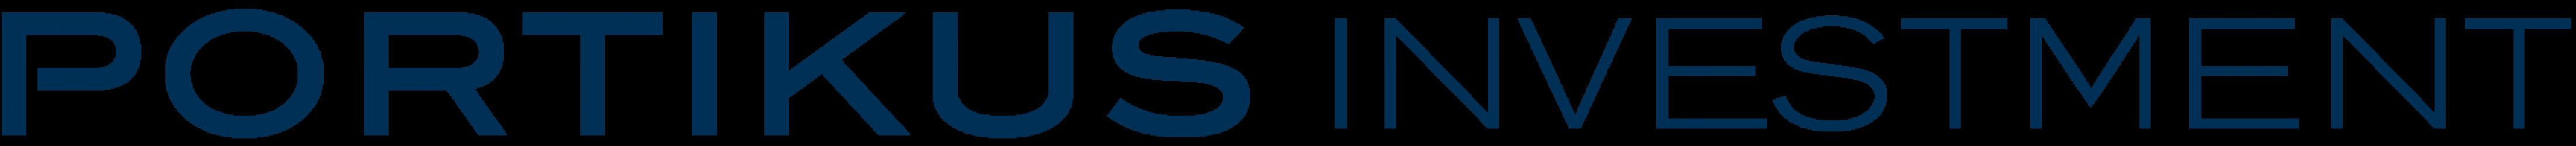 Portikus Investment GmbH